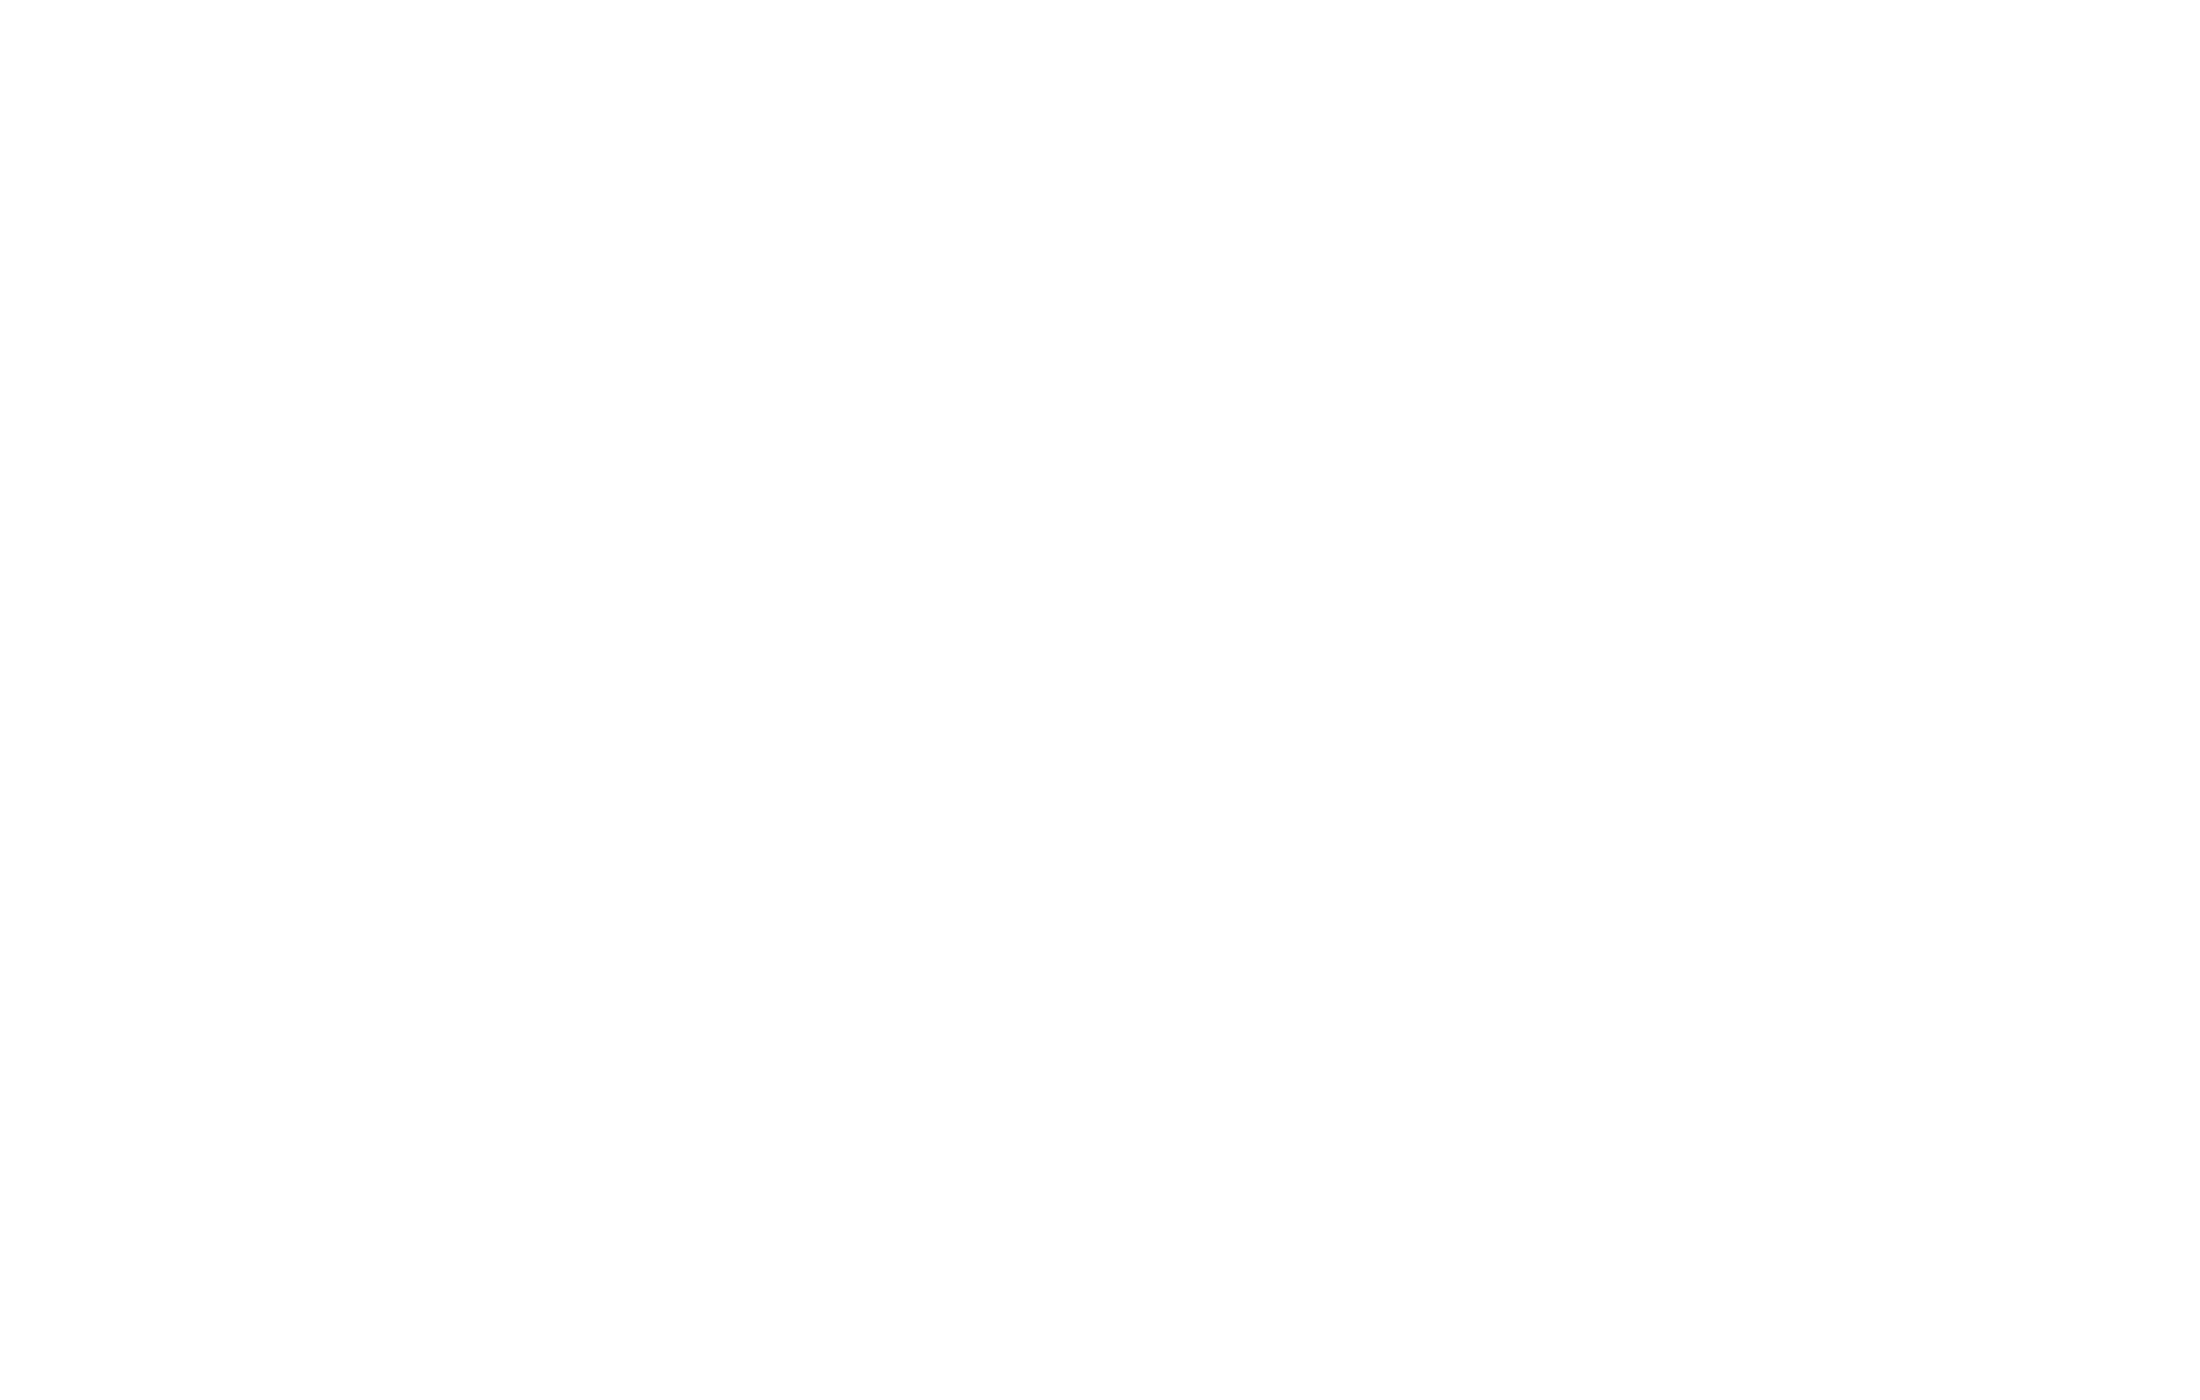 pc1yexo3 t onm https www epicgames com fortnite en us fortnite crew subscription